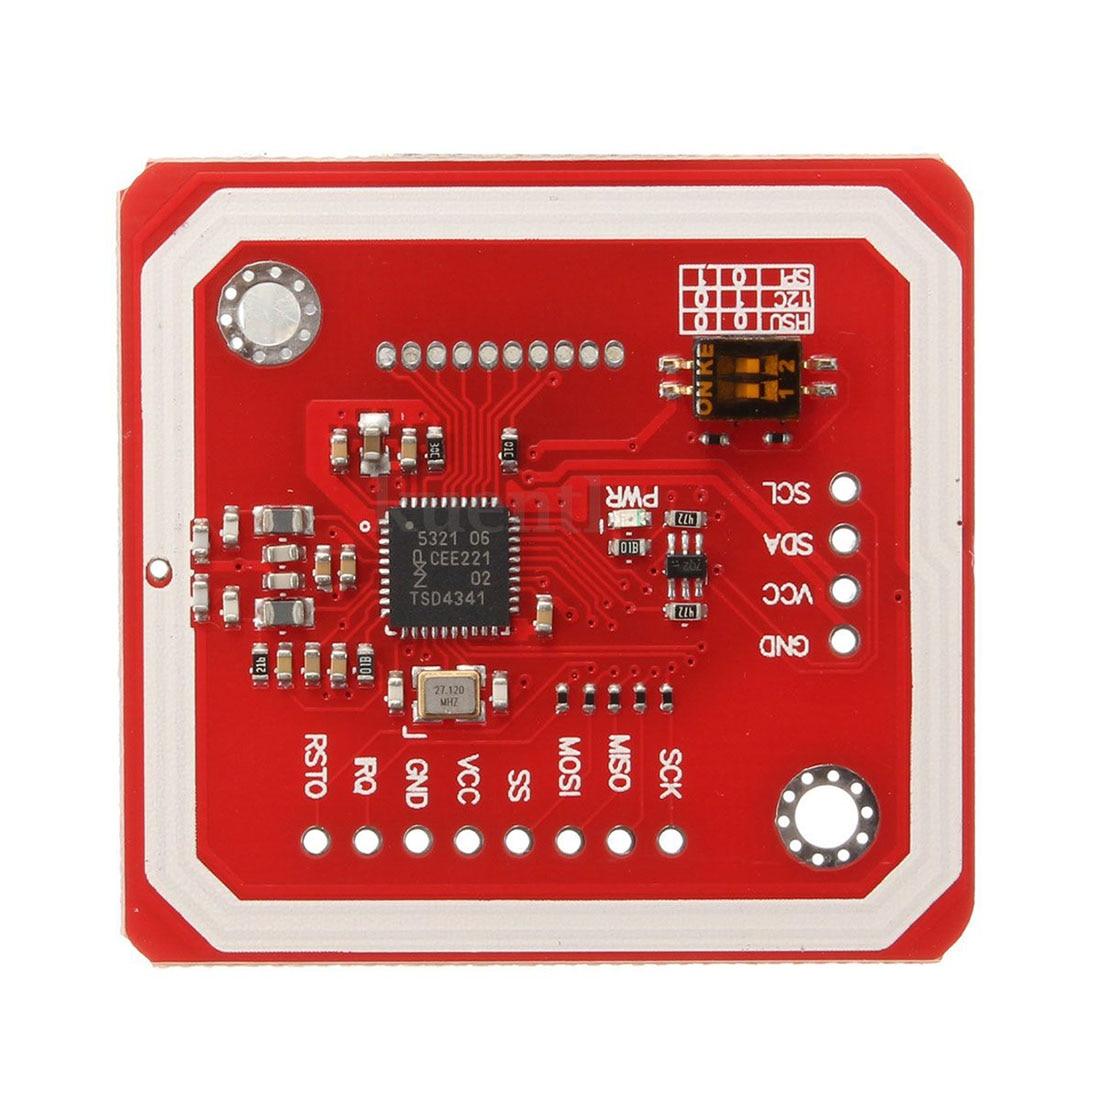 где купить Wholesale PN532 NFC RFID  V3  Module Kits  for Arduino Android по лучшей цене